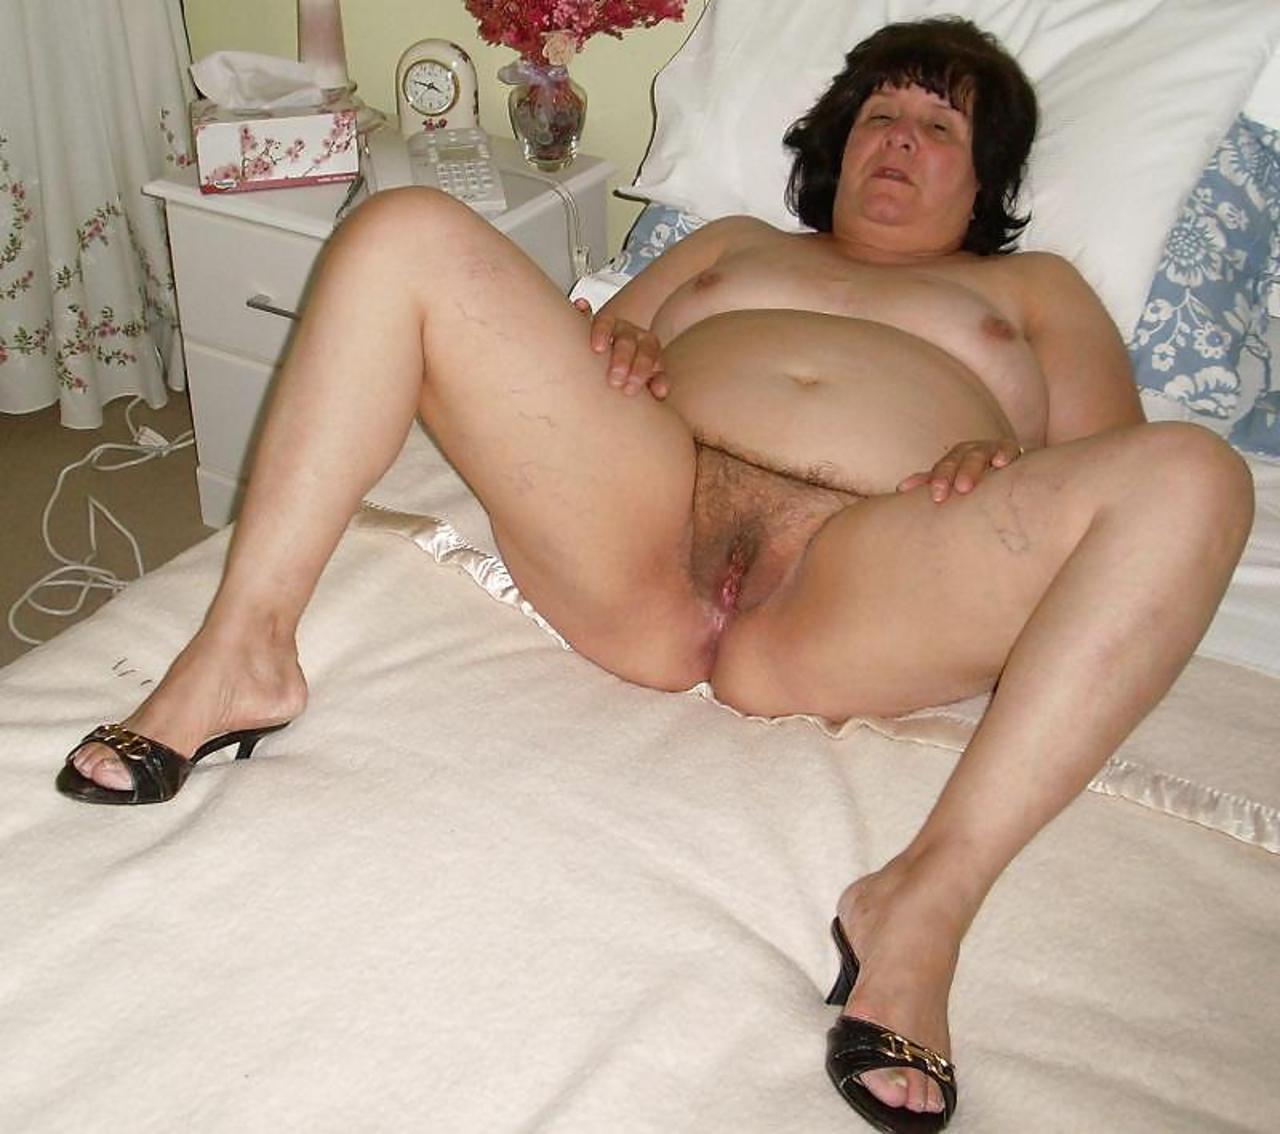 Nadine velazquez nude flight